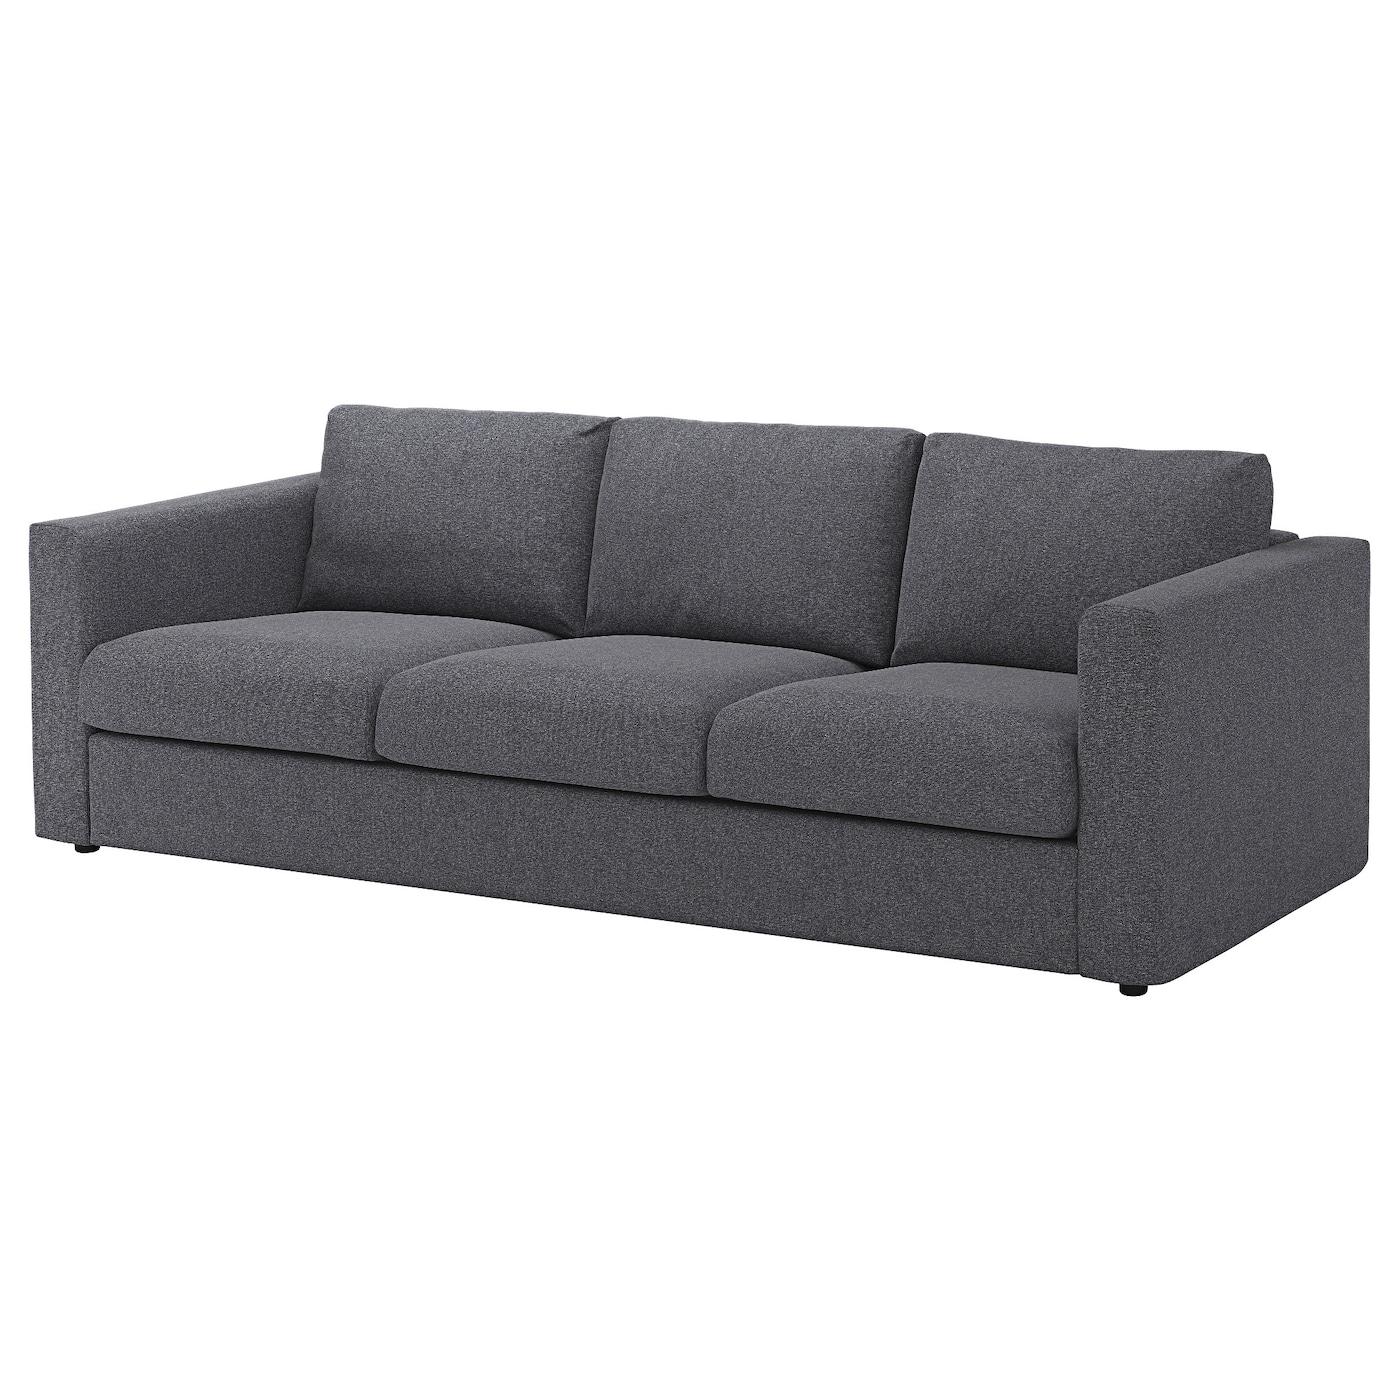 IKEA VIMLE Sofa 3-osobowa, Gunnared średnioszary